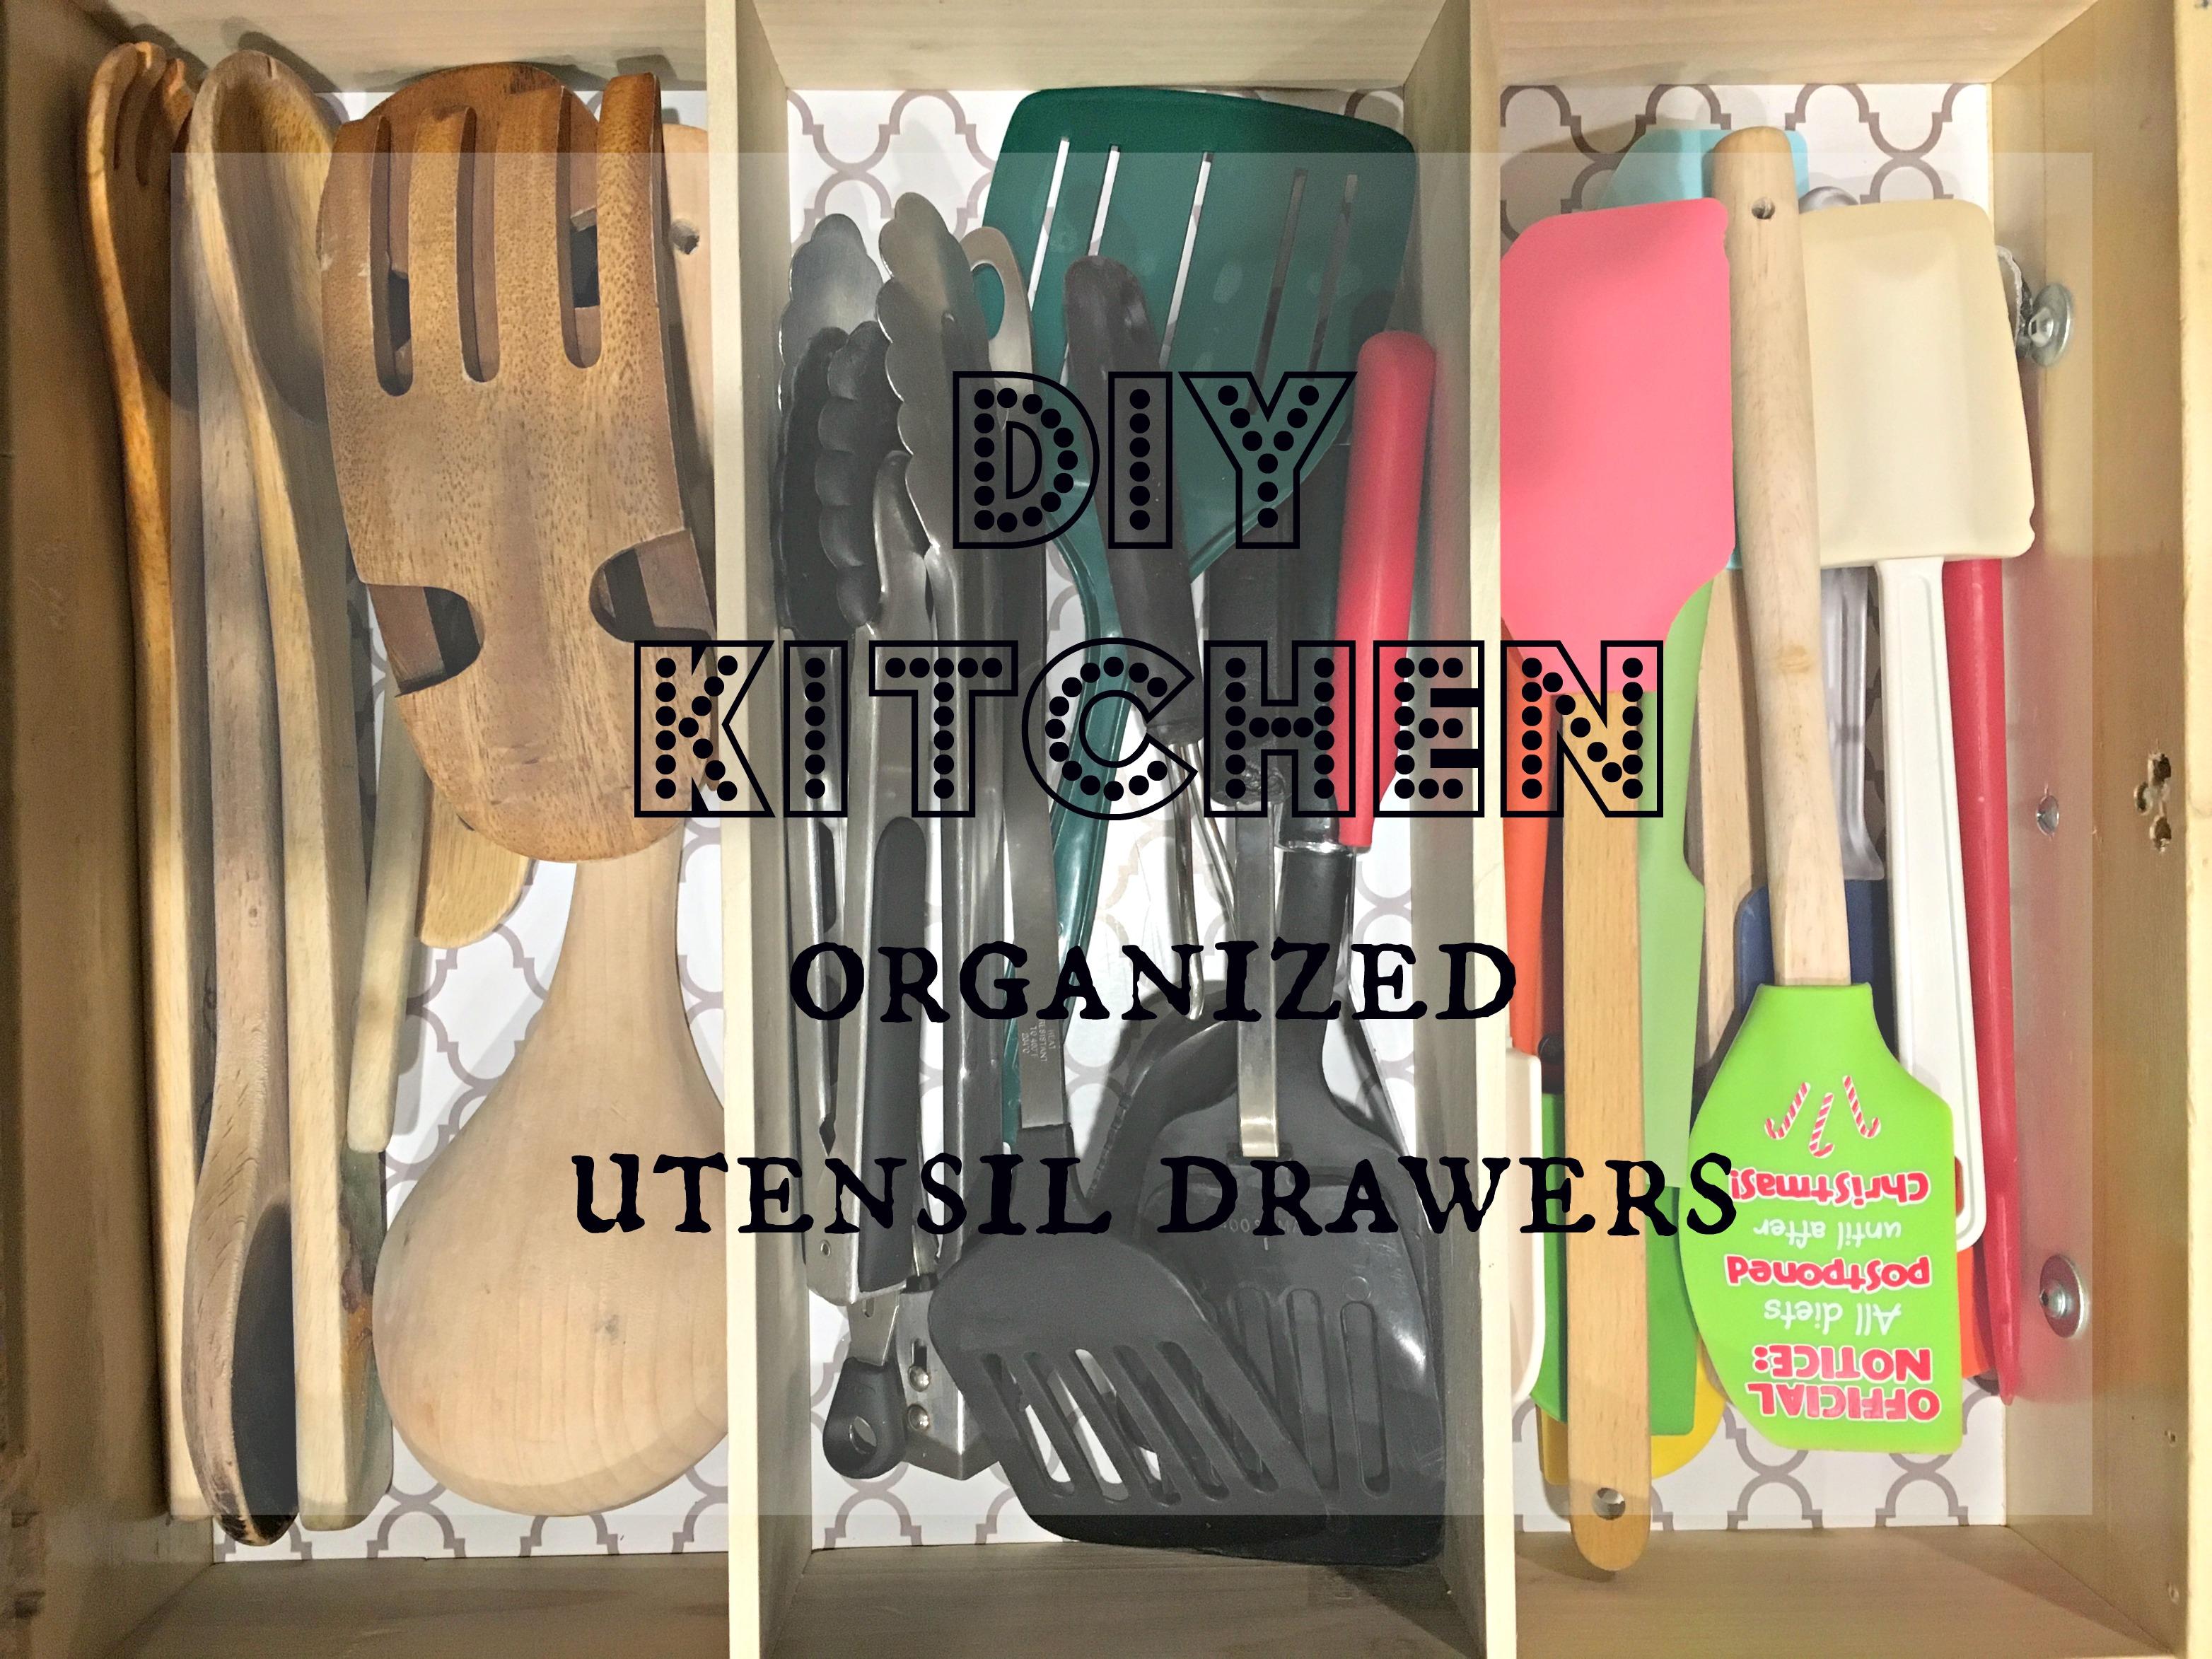 DIY Kitchen Organized Utensil Drawers